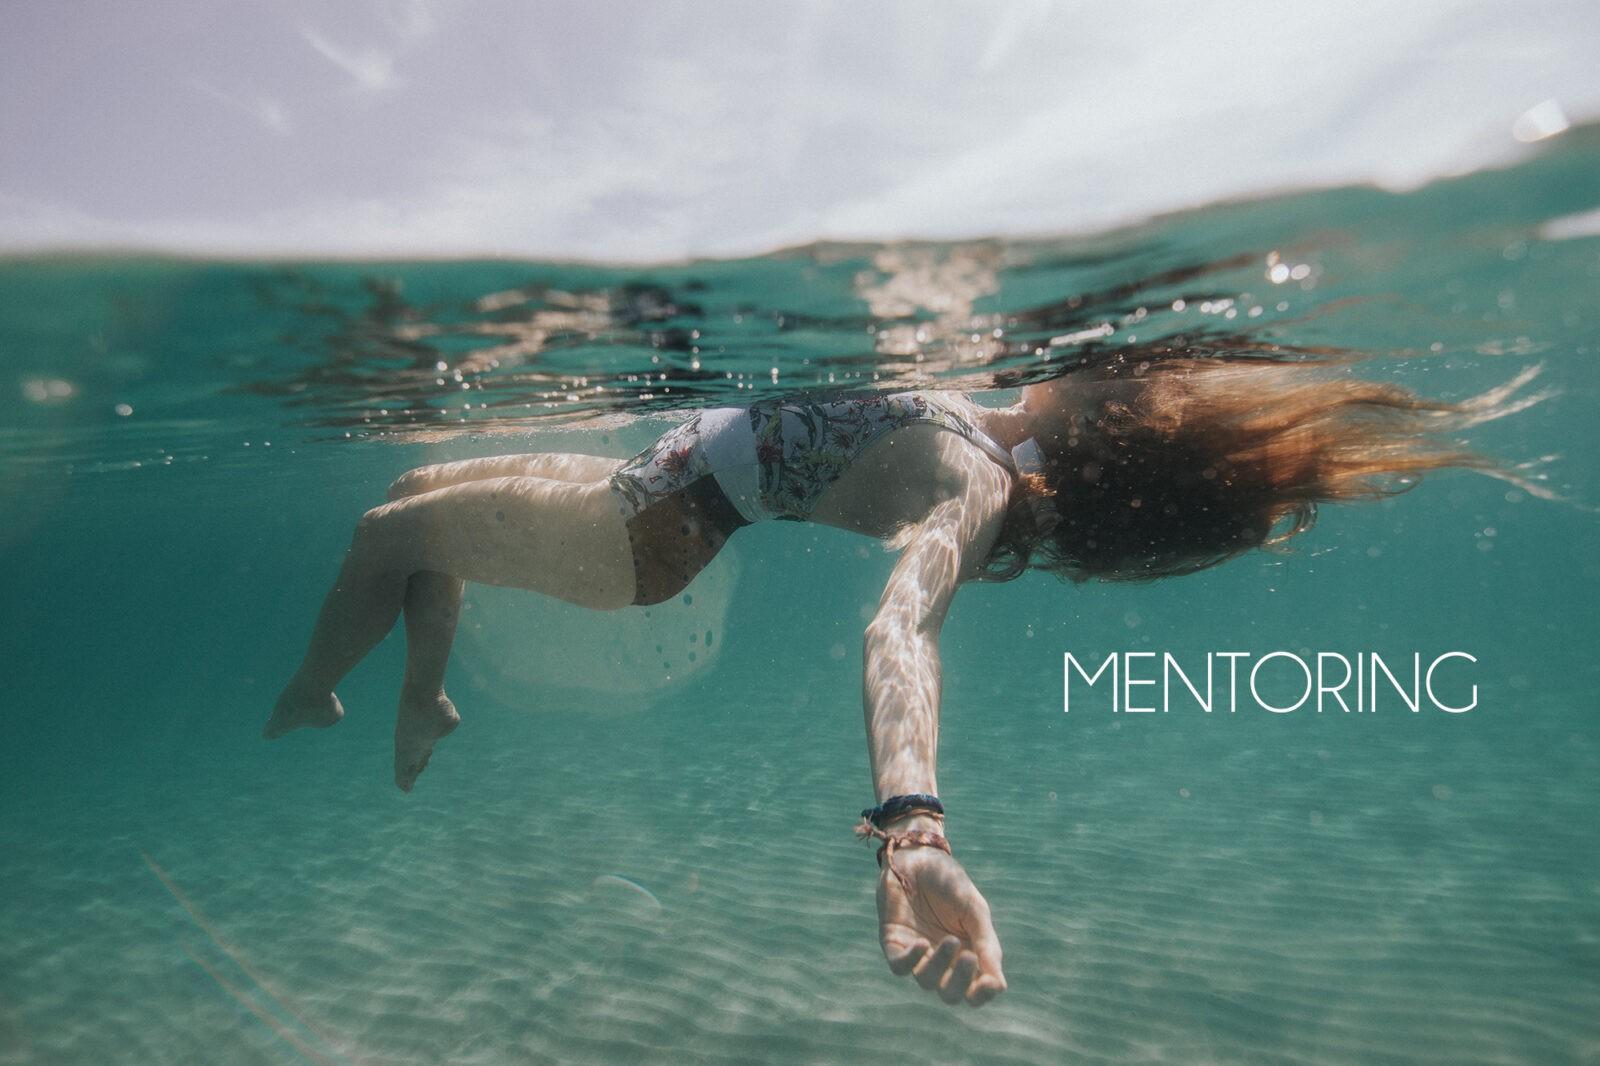 underwater mentoring session